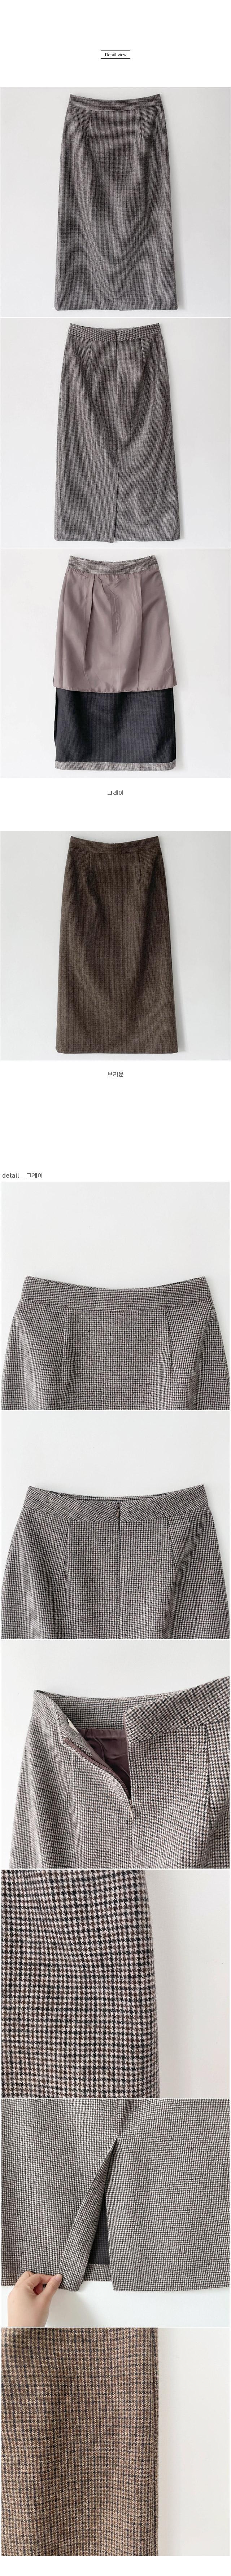 Vera check long skirt